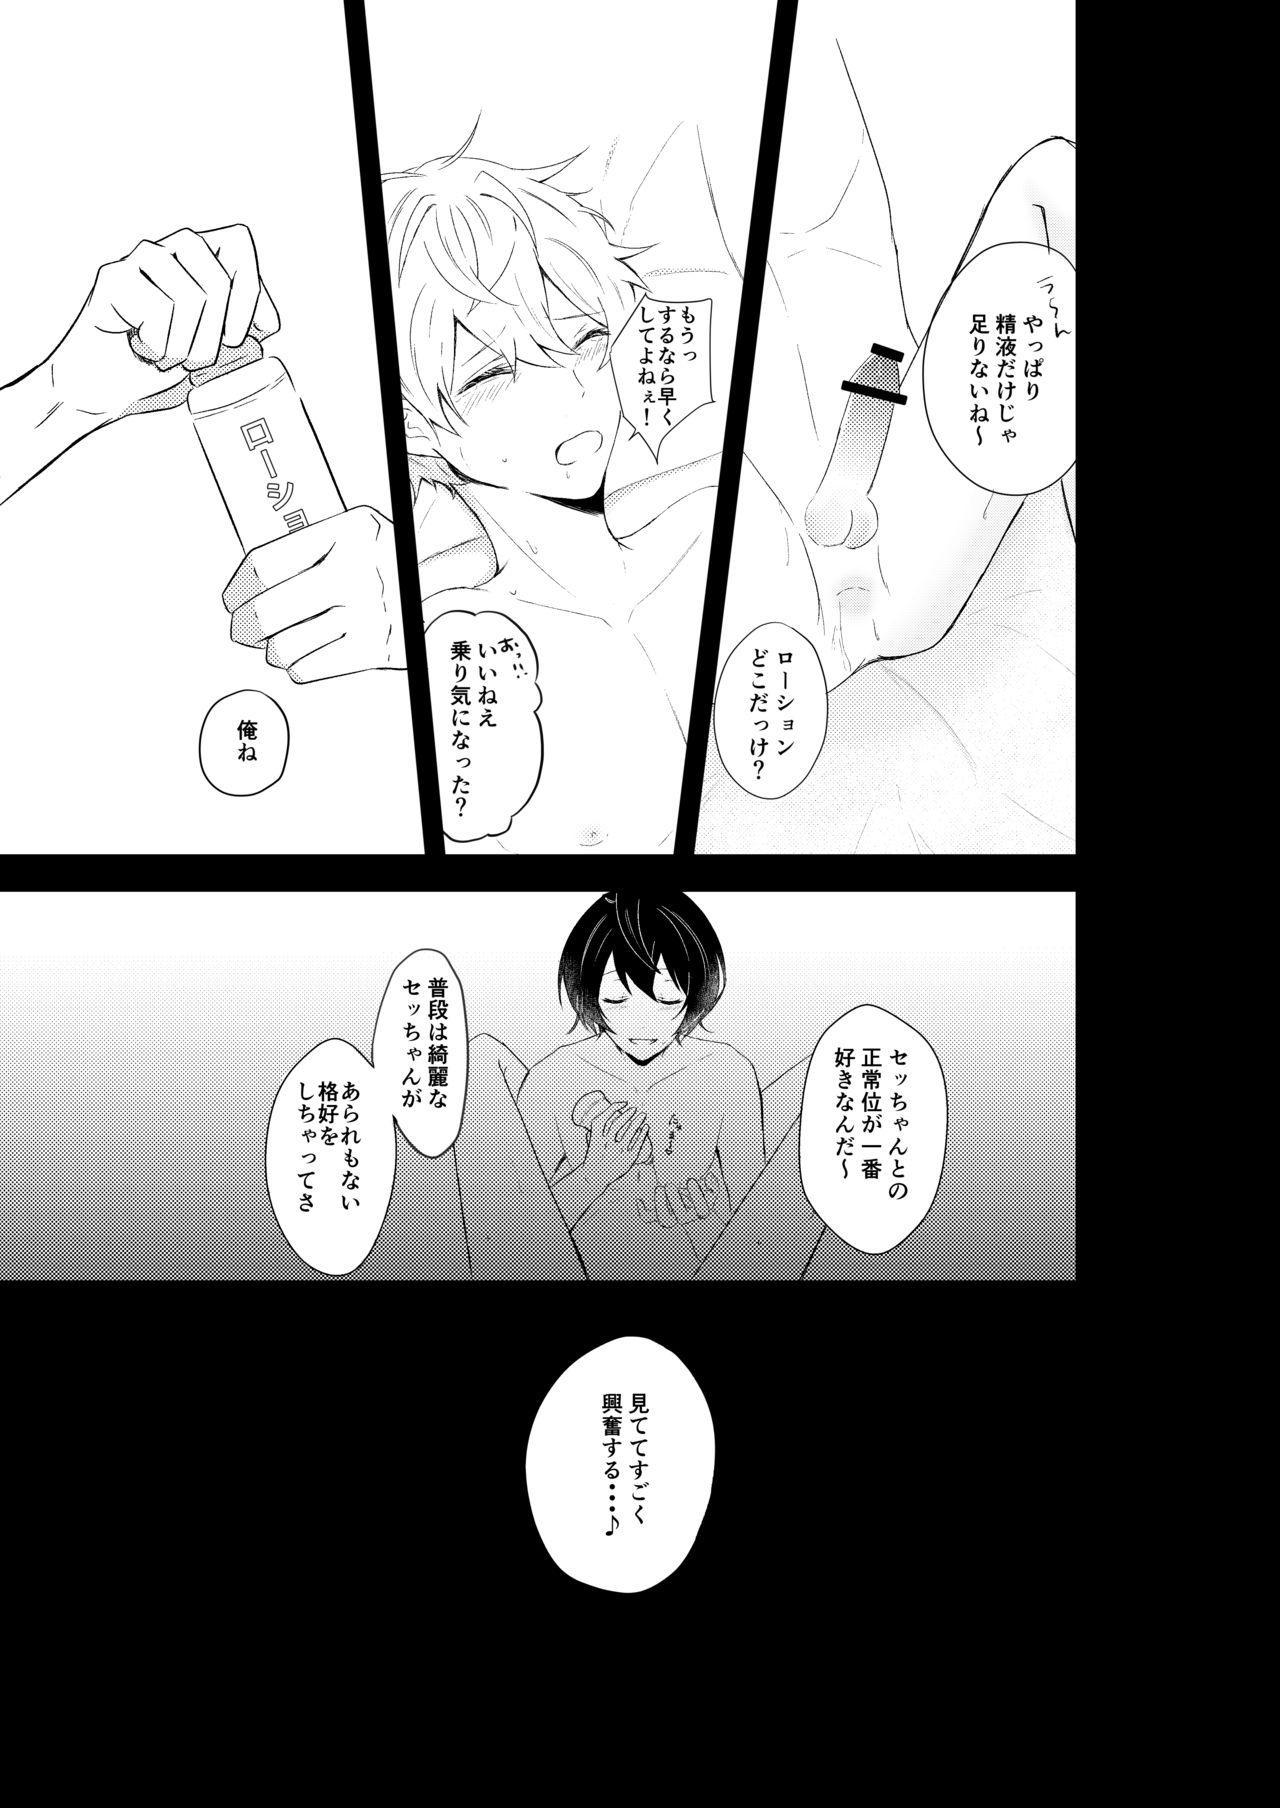 Midnight dream 11